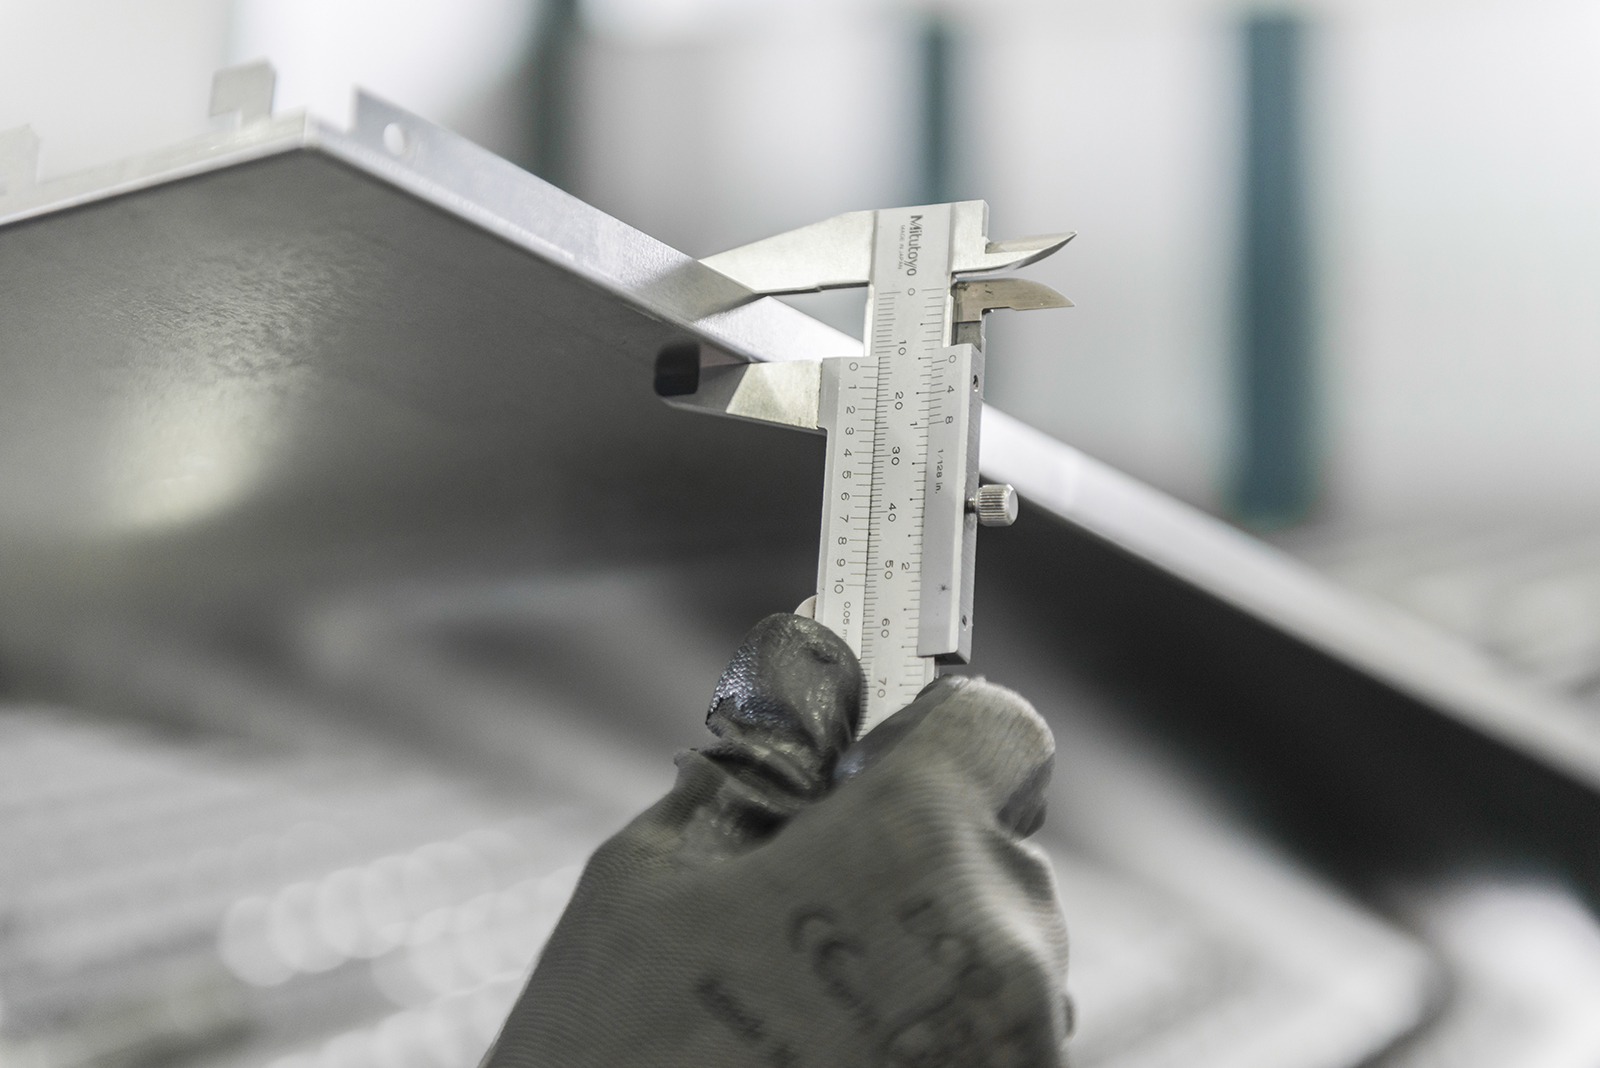 Roundcube architectural photography,  maria mavropoulou,  φωτογράφιση εκθέσεων, φωτογράφιση εσωτερικών χώρων, φωτογράφιση έργων τέχνης, Μαρία Μαυροπούλου,  αρχιτεκτονική φωτογραφία, VETA S.A.  Precision Sheet Metal Fabrication